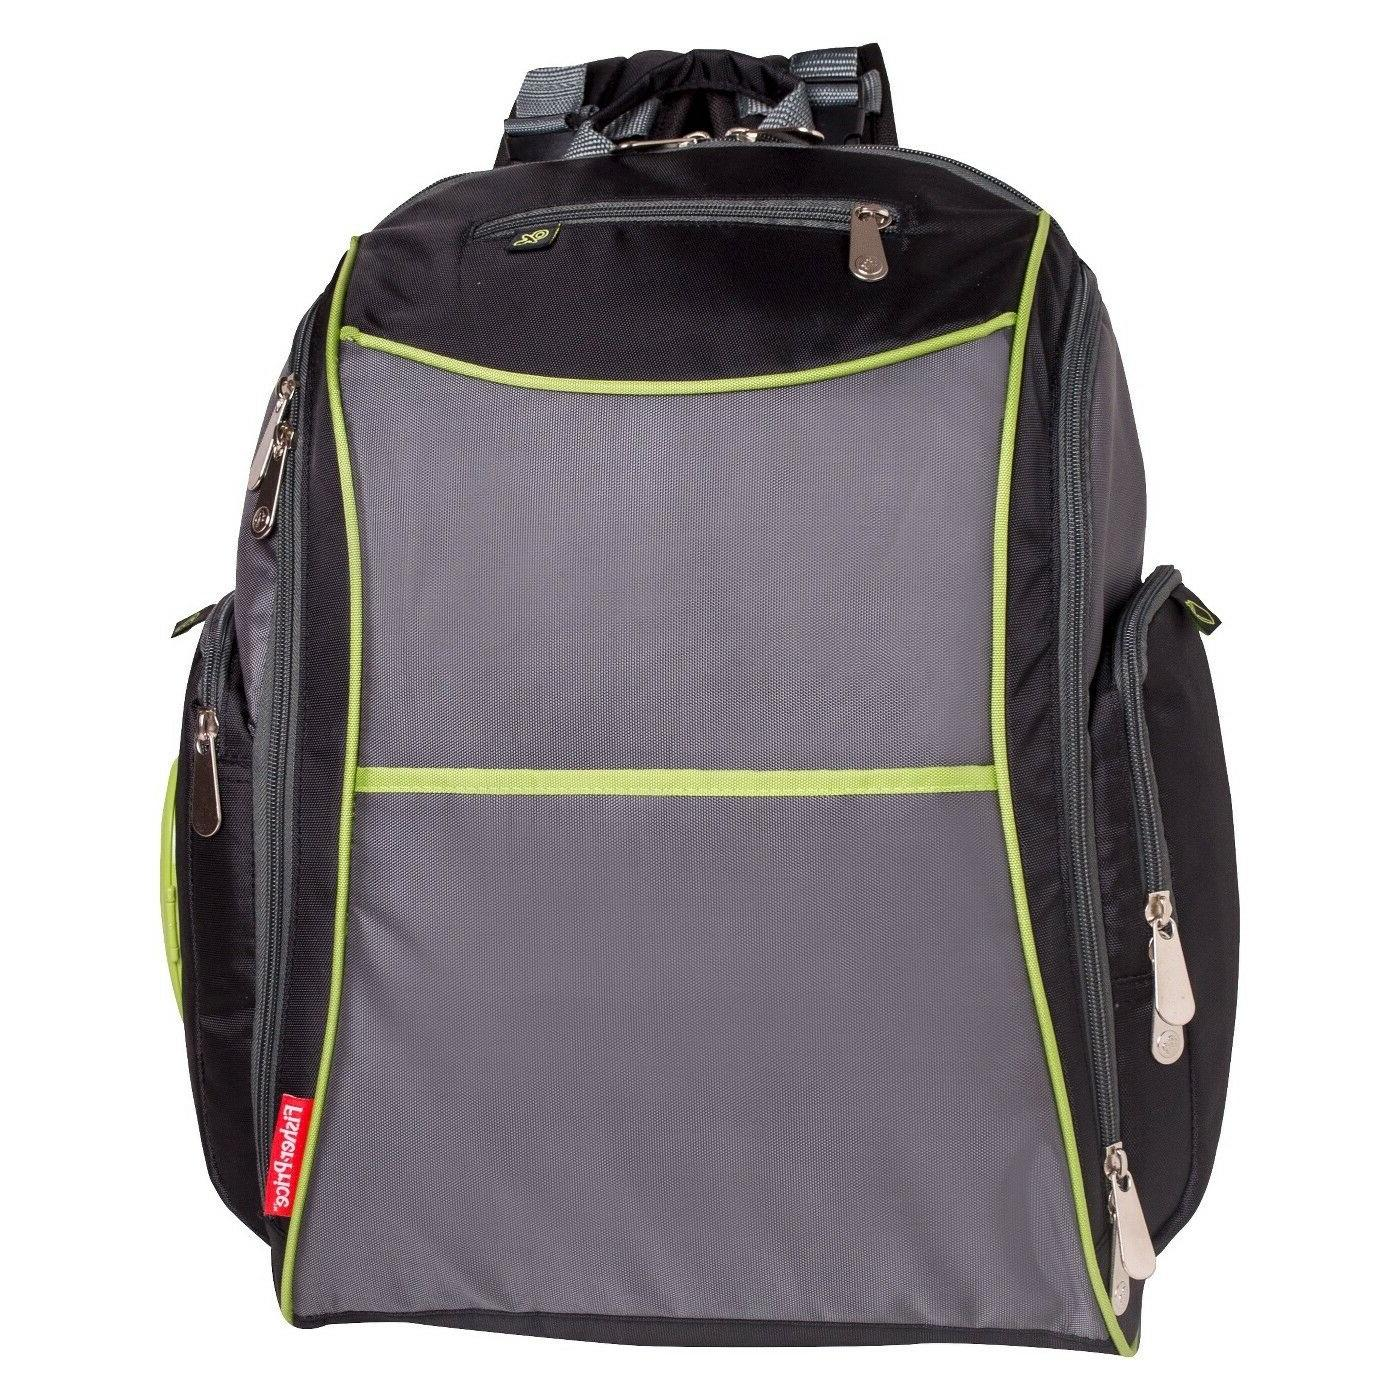 fastfinder sturdy nylon diaper backpack